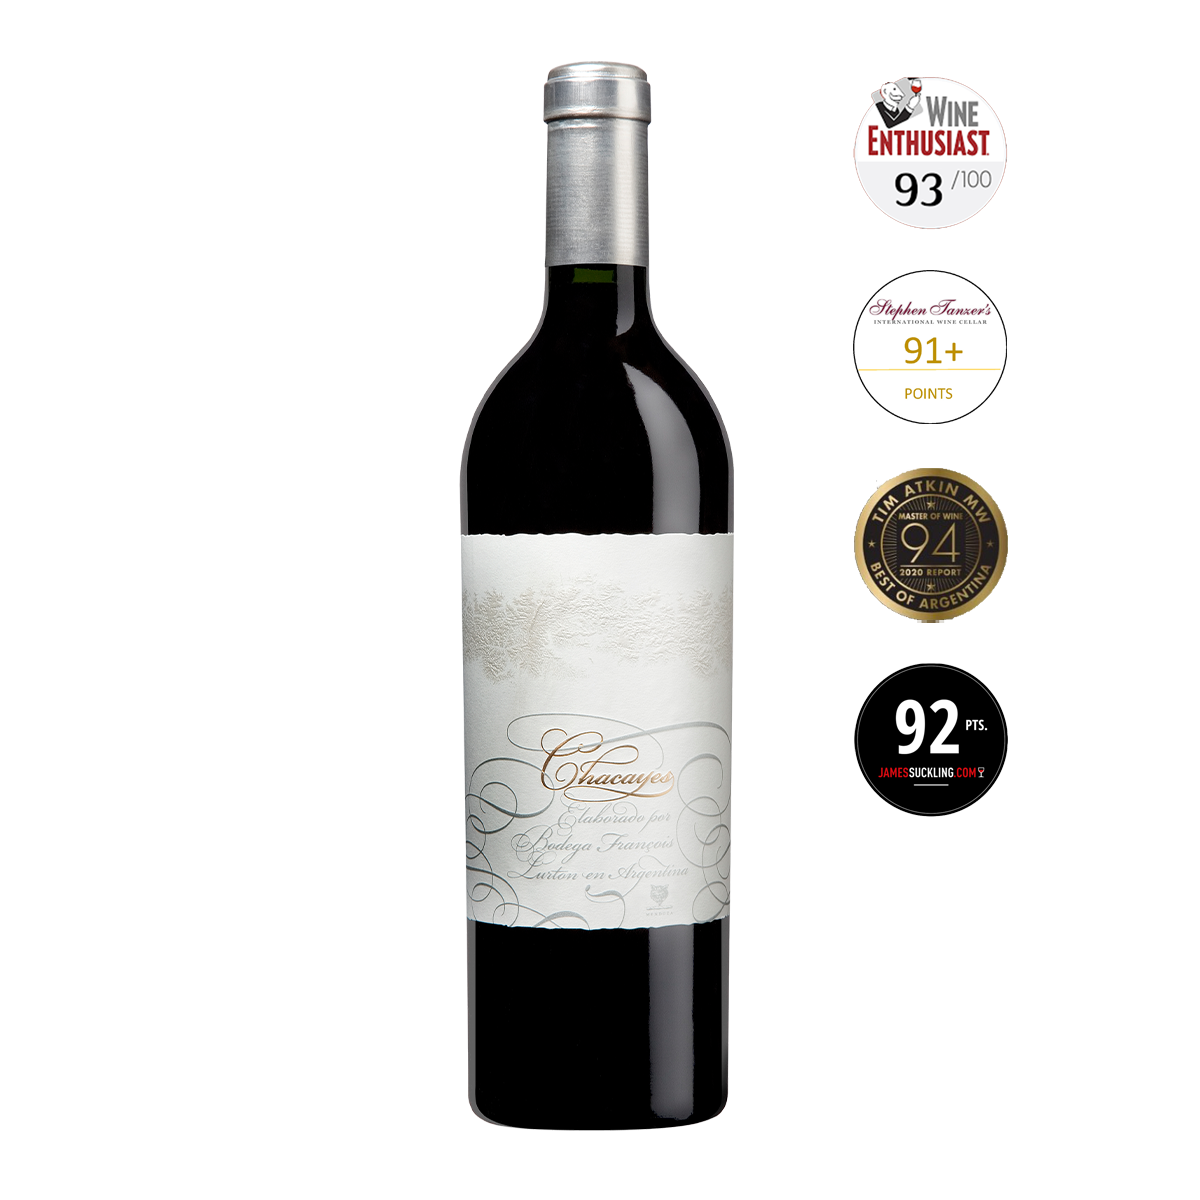 ARL1305 阿根廷門多薩魯頓恰克雅2008國寶旗艦頂級陳年紅酒 Chacayes, Mendoza (750ml)